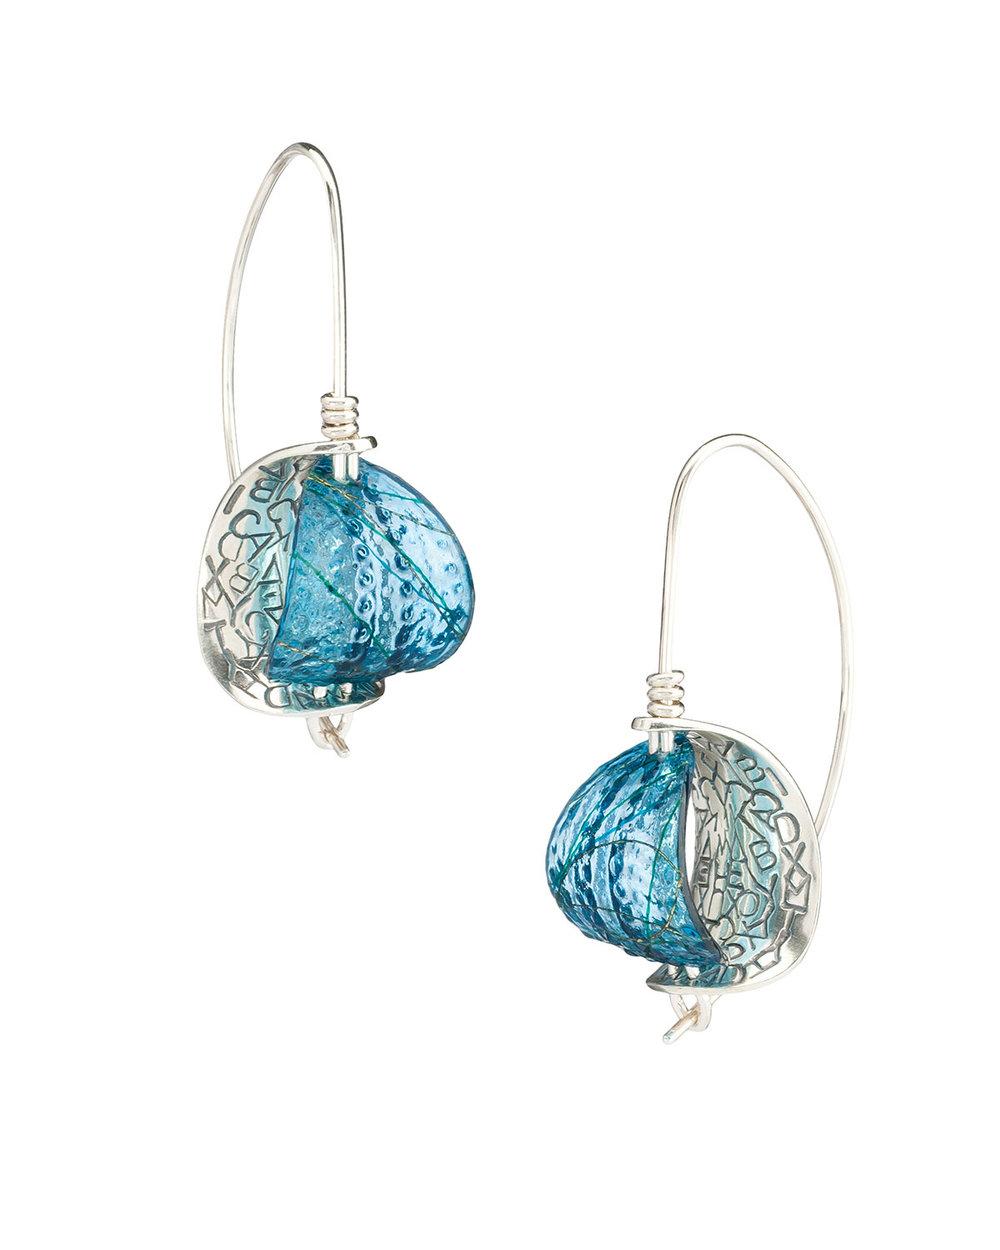 2017-11-Mary-Lynn-Podiluk-Retroflex-Earrings-SM-07a.jpg